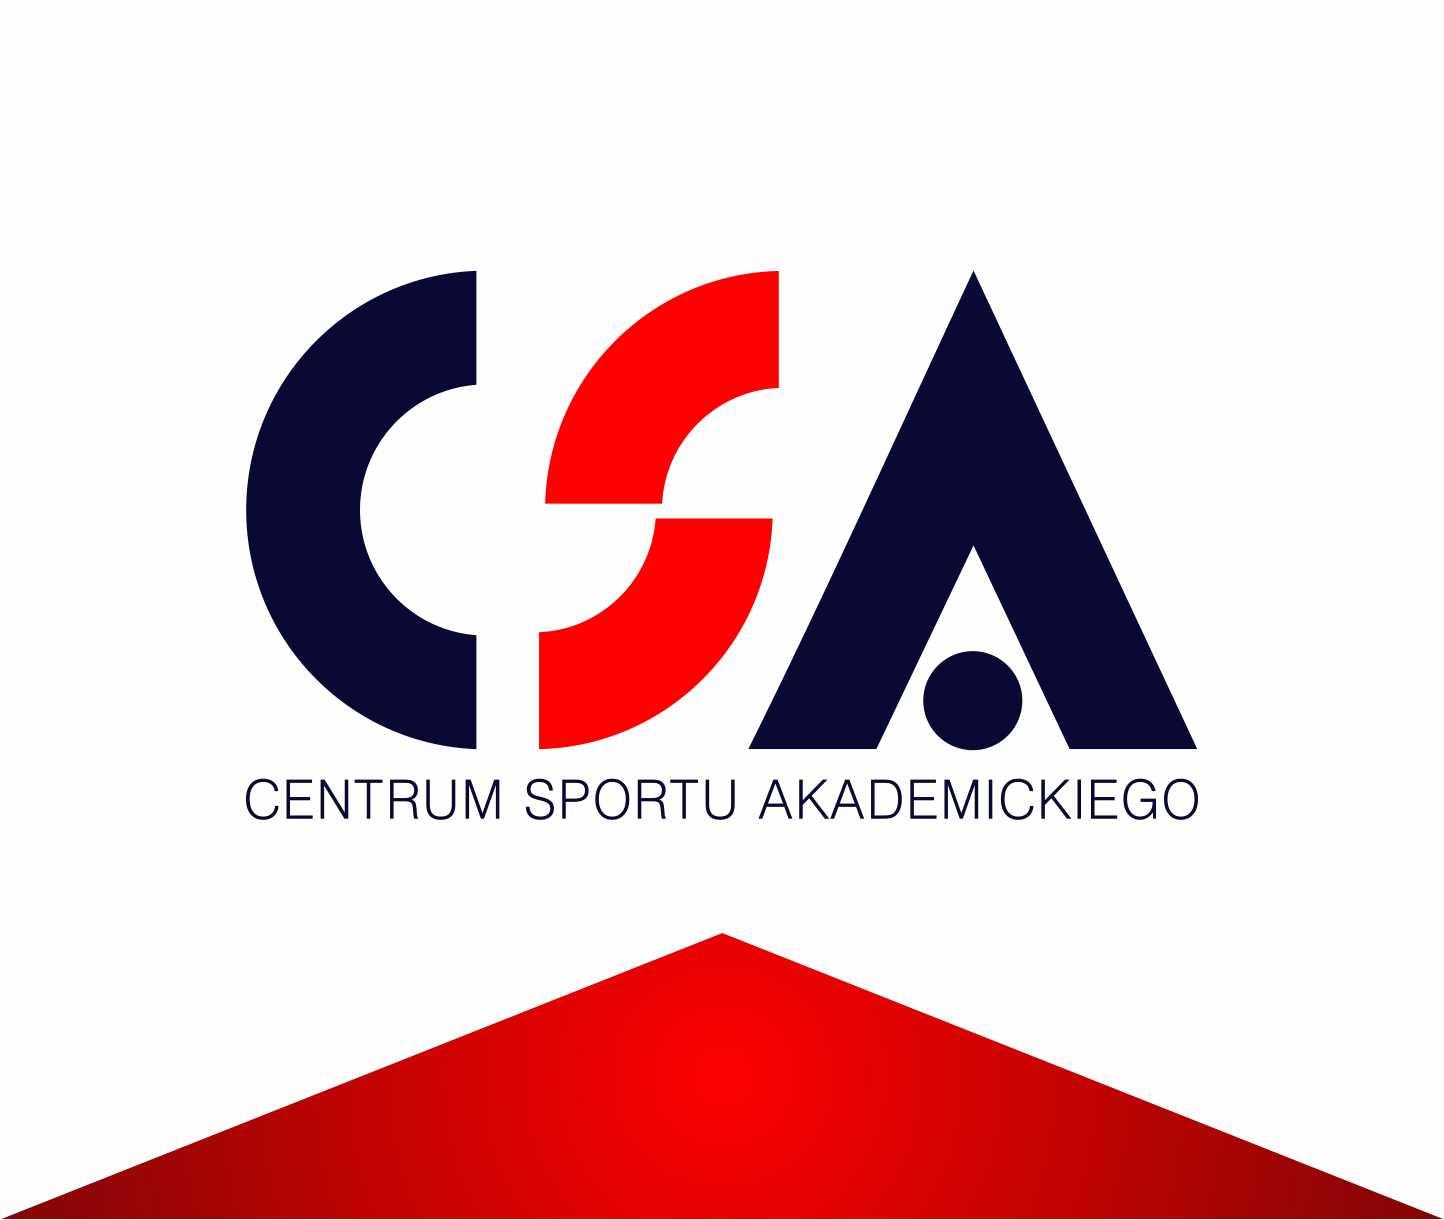 Centrum Sportu Akademickiego PG